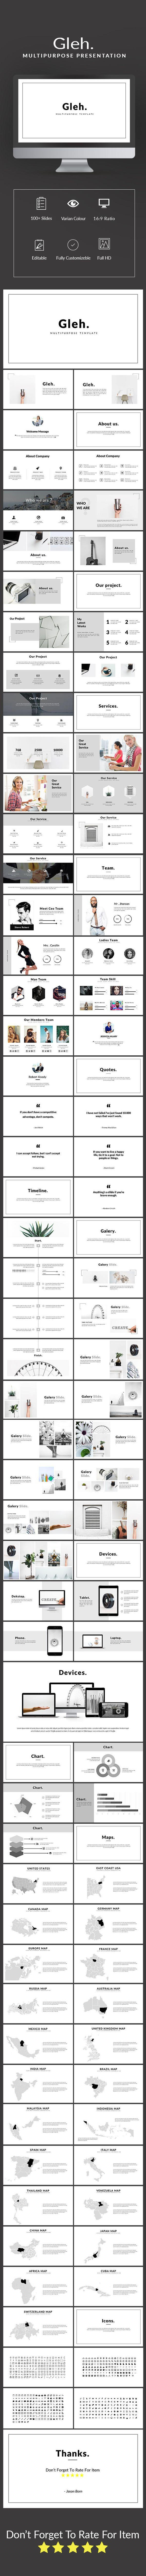 Gleh Multipurpose Template - PowerPoint Templates Presentation Templates